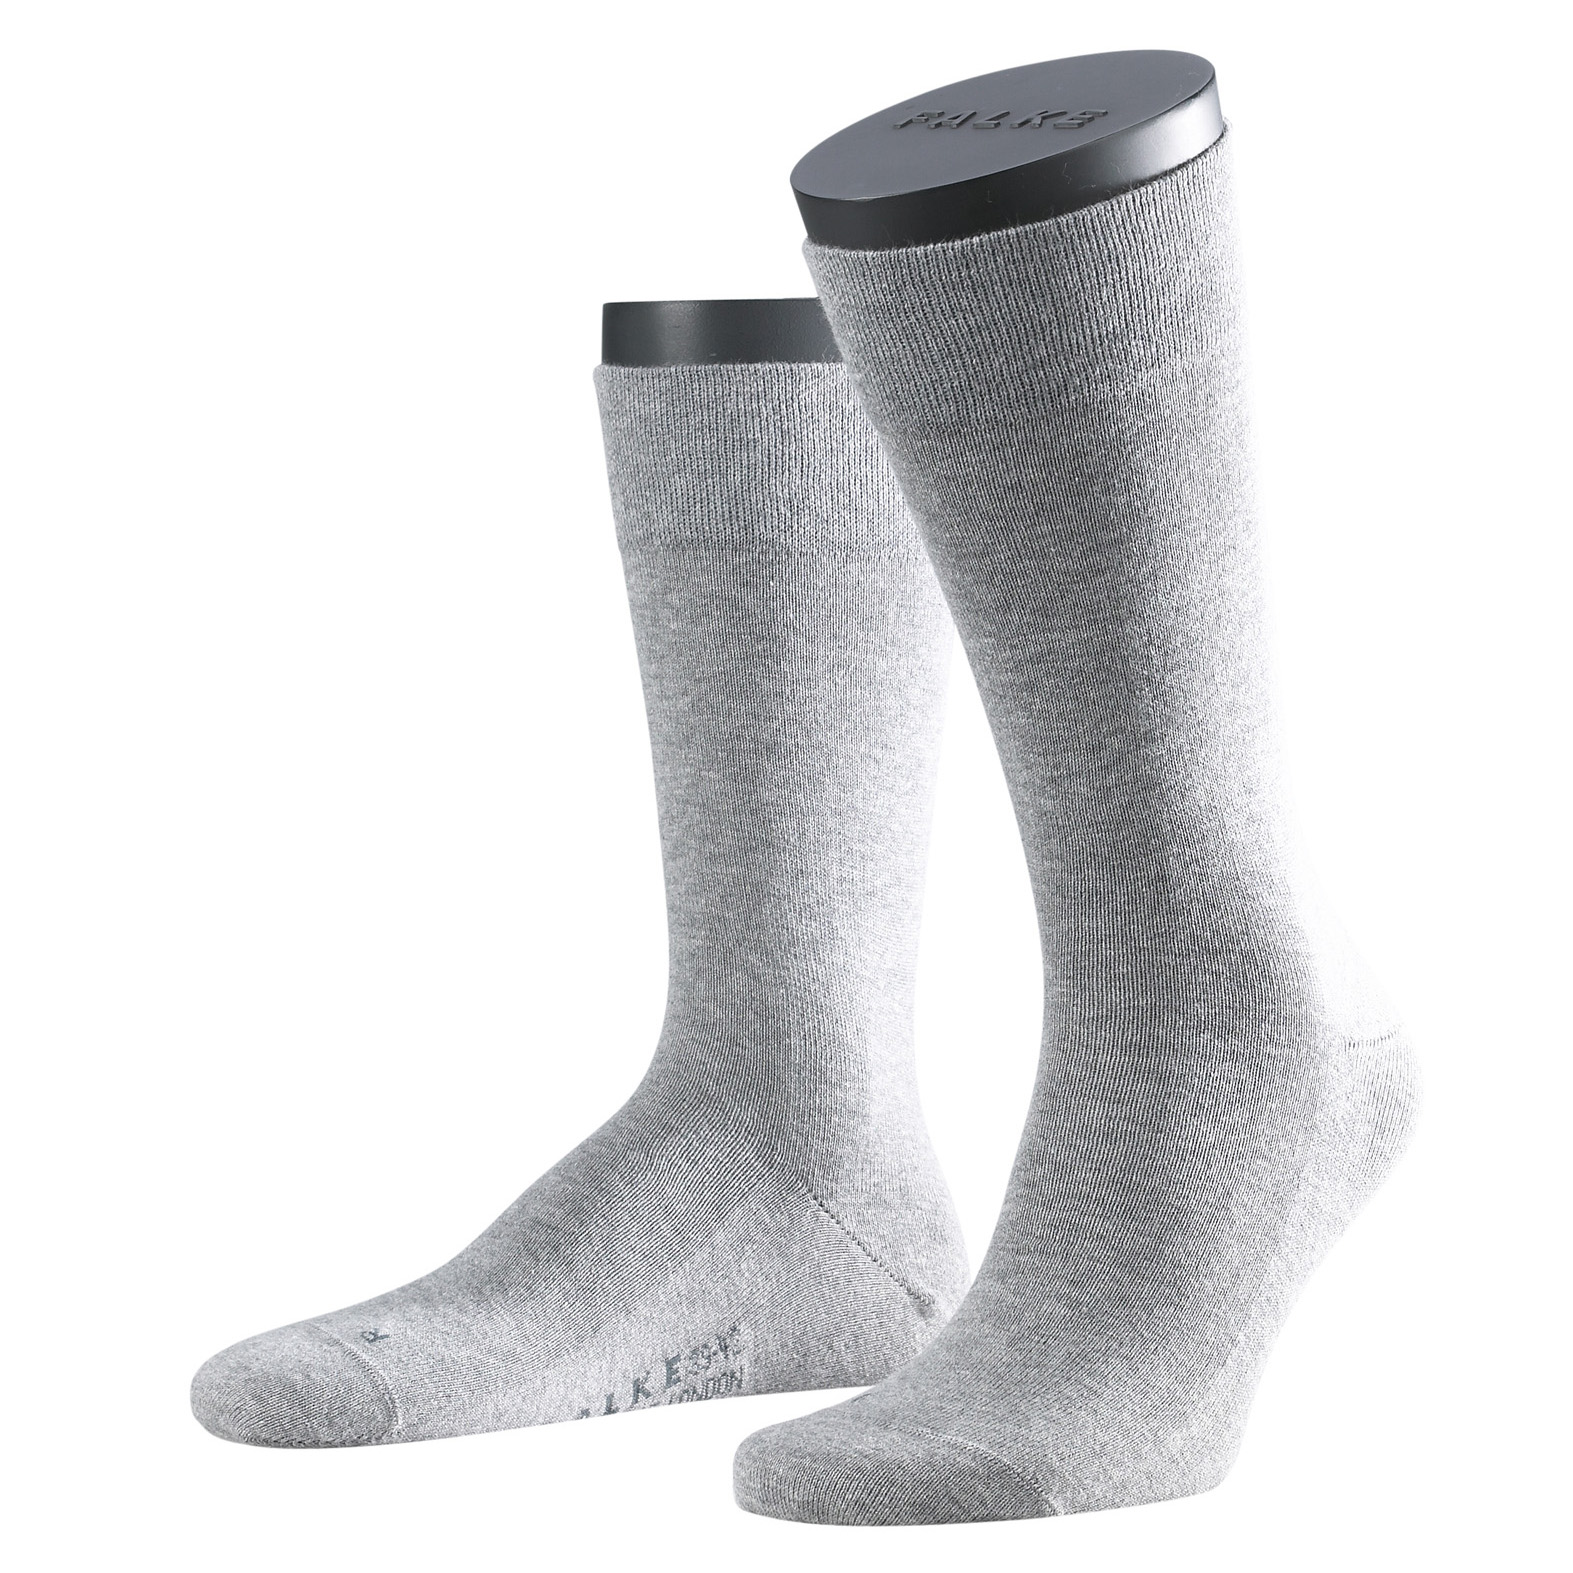 Falke Sensitive Socke London hell grau 14616 - 3390 Basic Baumwolle